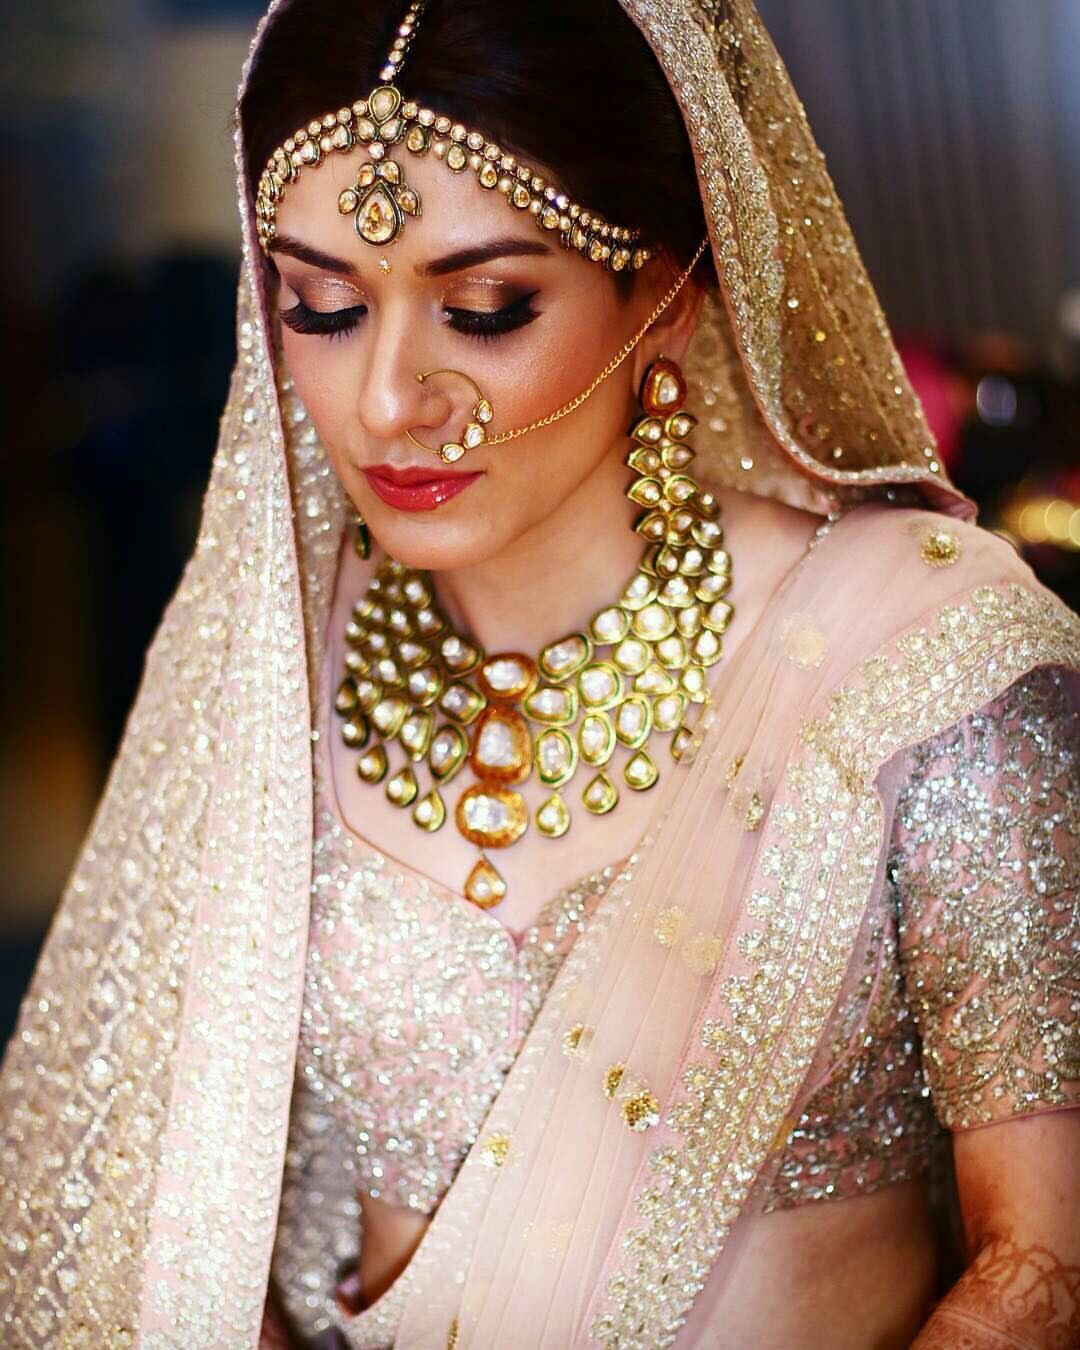 Pin by Rose on Bridal kundan jewellery   Indian bridal makeup, Best bridal makeup, Bride